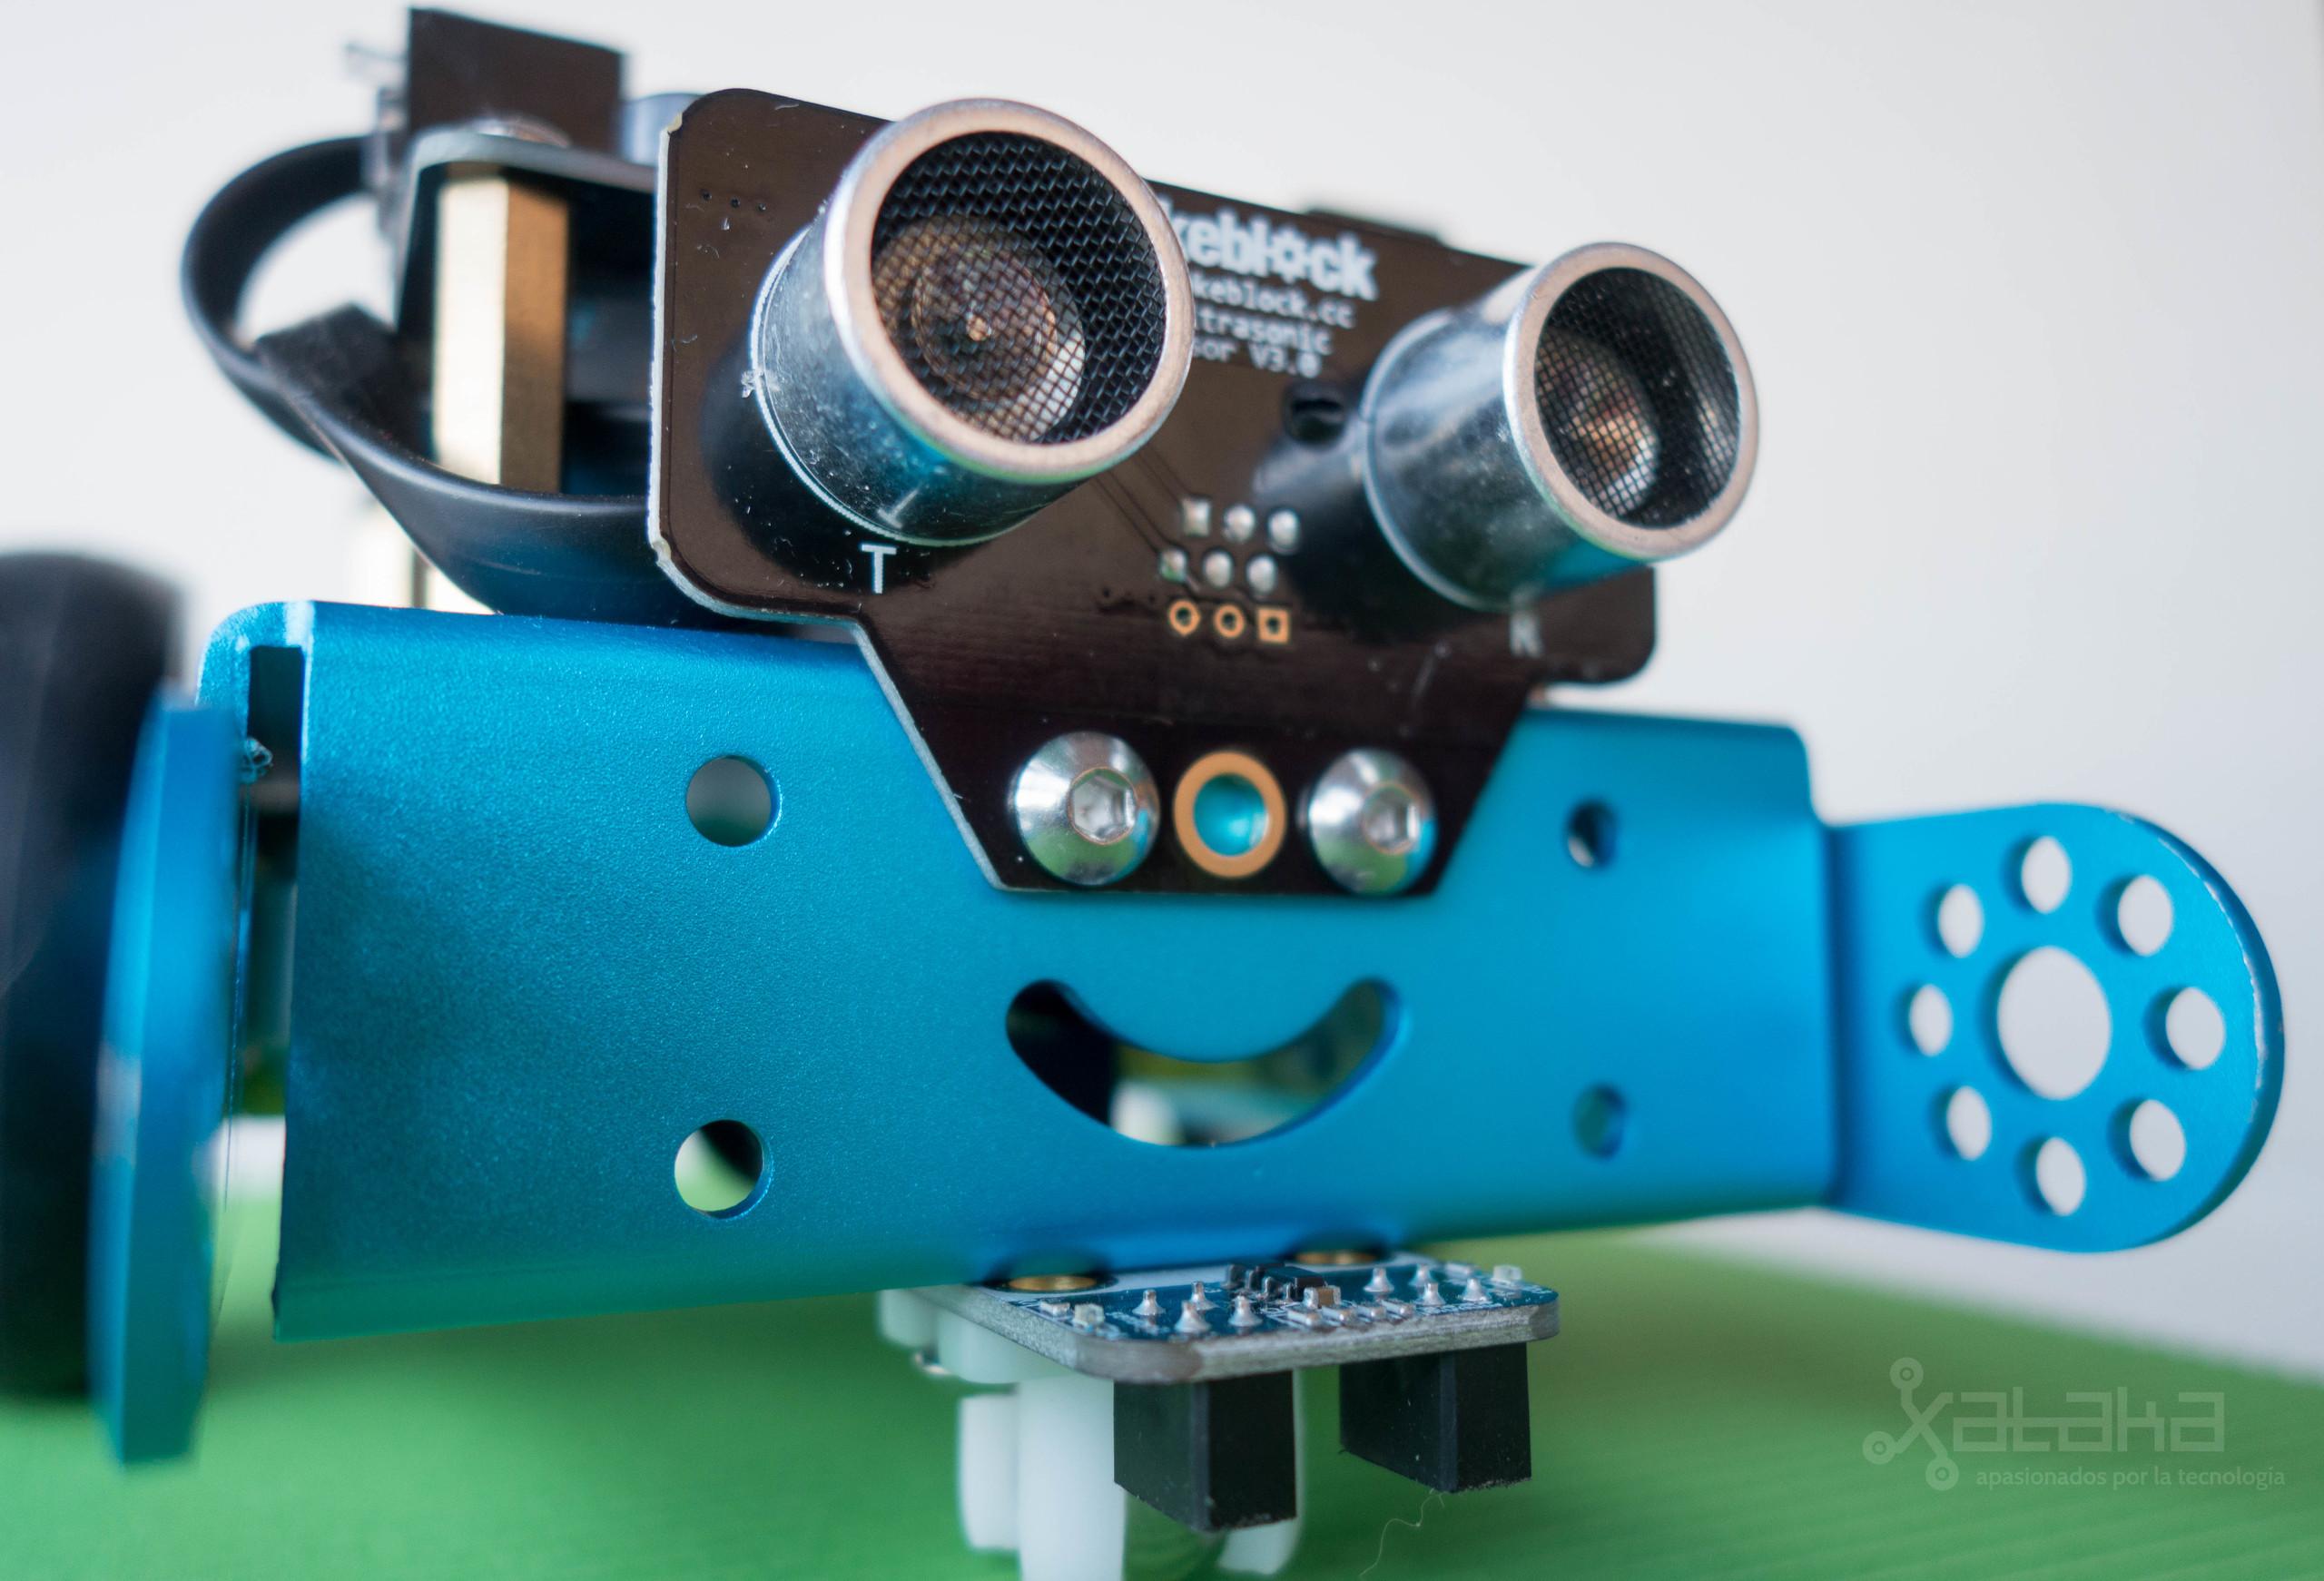 SPC-Makeblock mBot, análisis